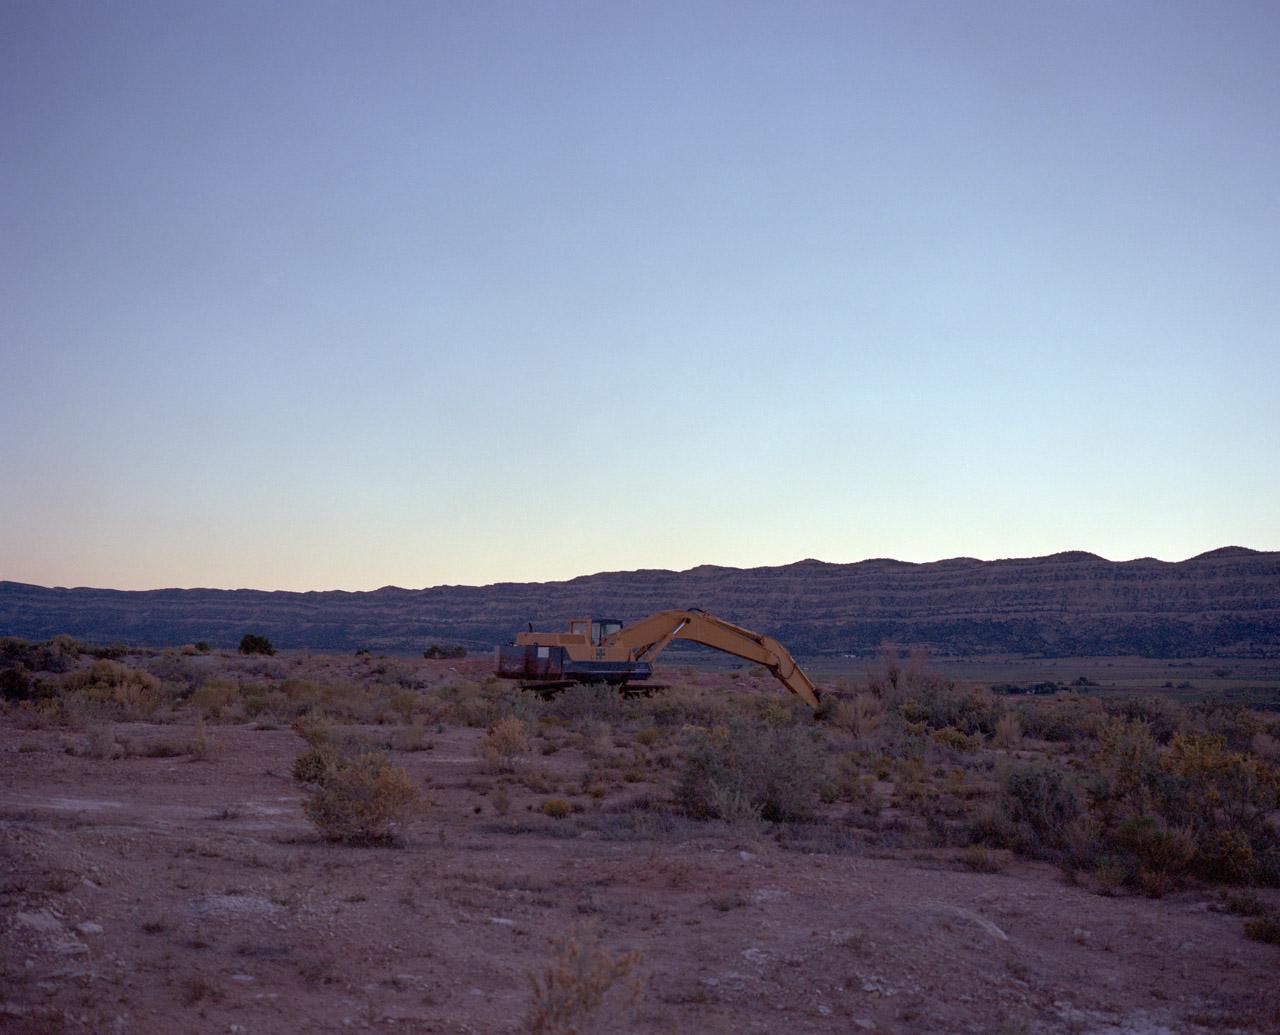 Crane at dusk outside of Escalante Utah. October, 2013.